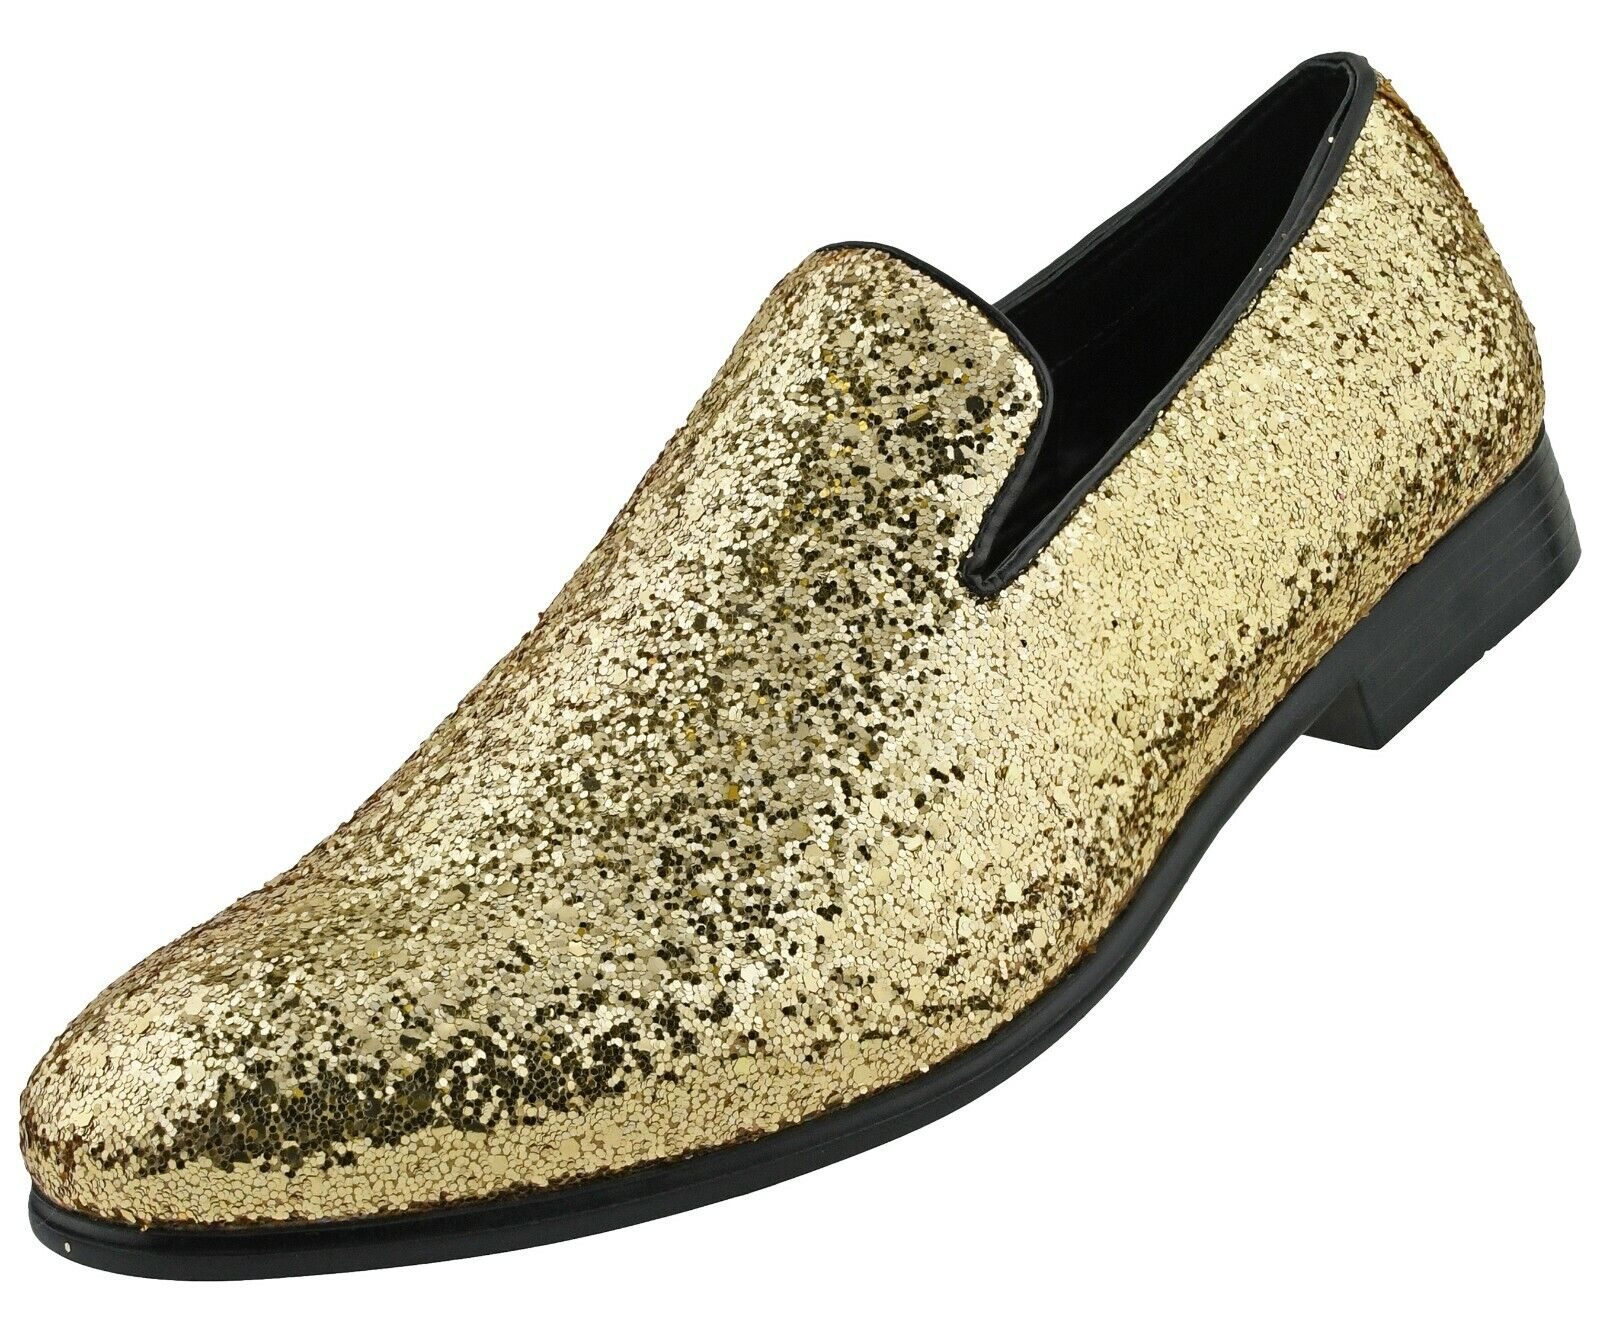 New Men/'s Gold Glitter Slip On Smoking Dress Shoes Tuxedo TUXXMAN ALL SIZES